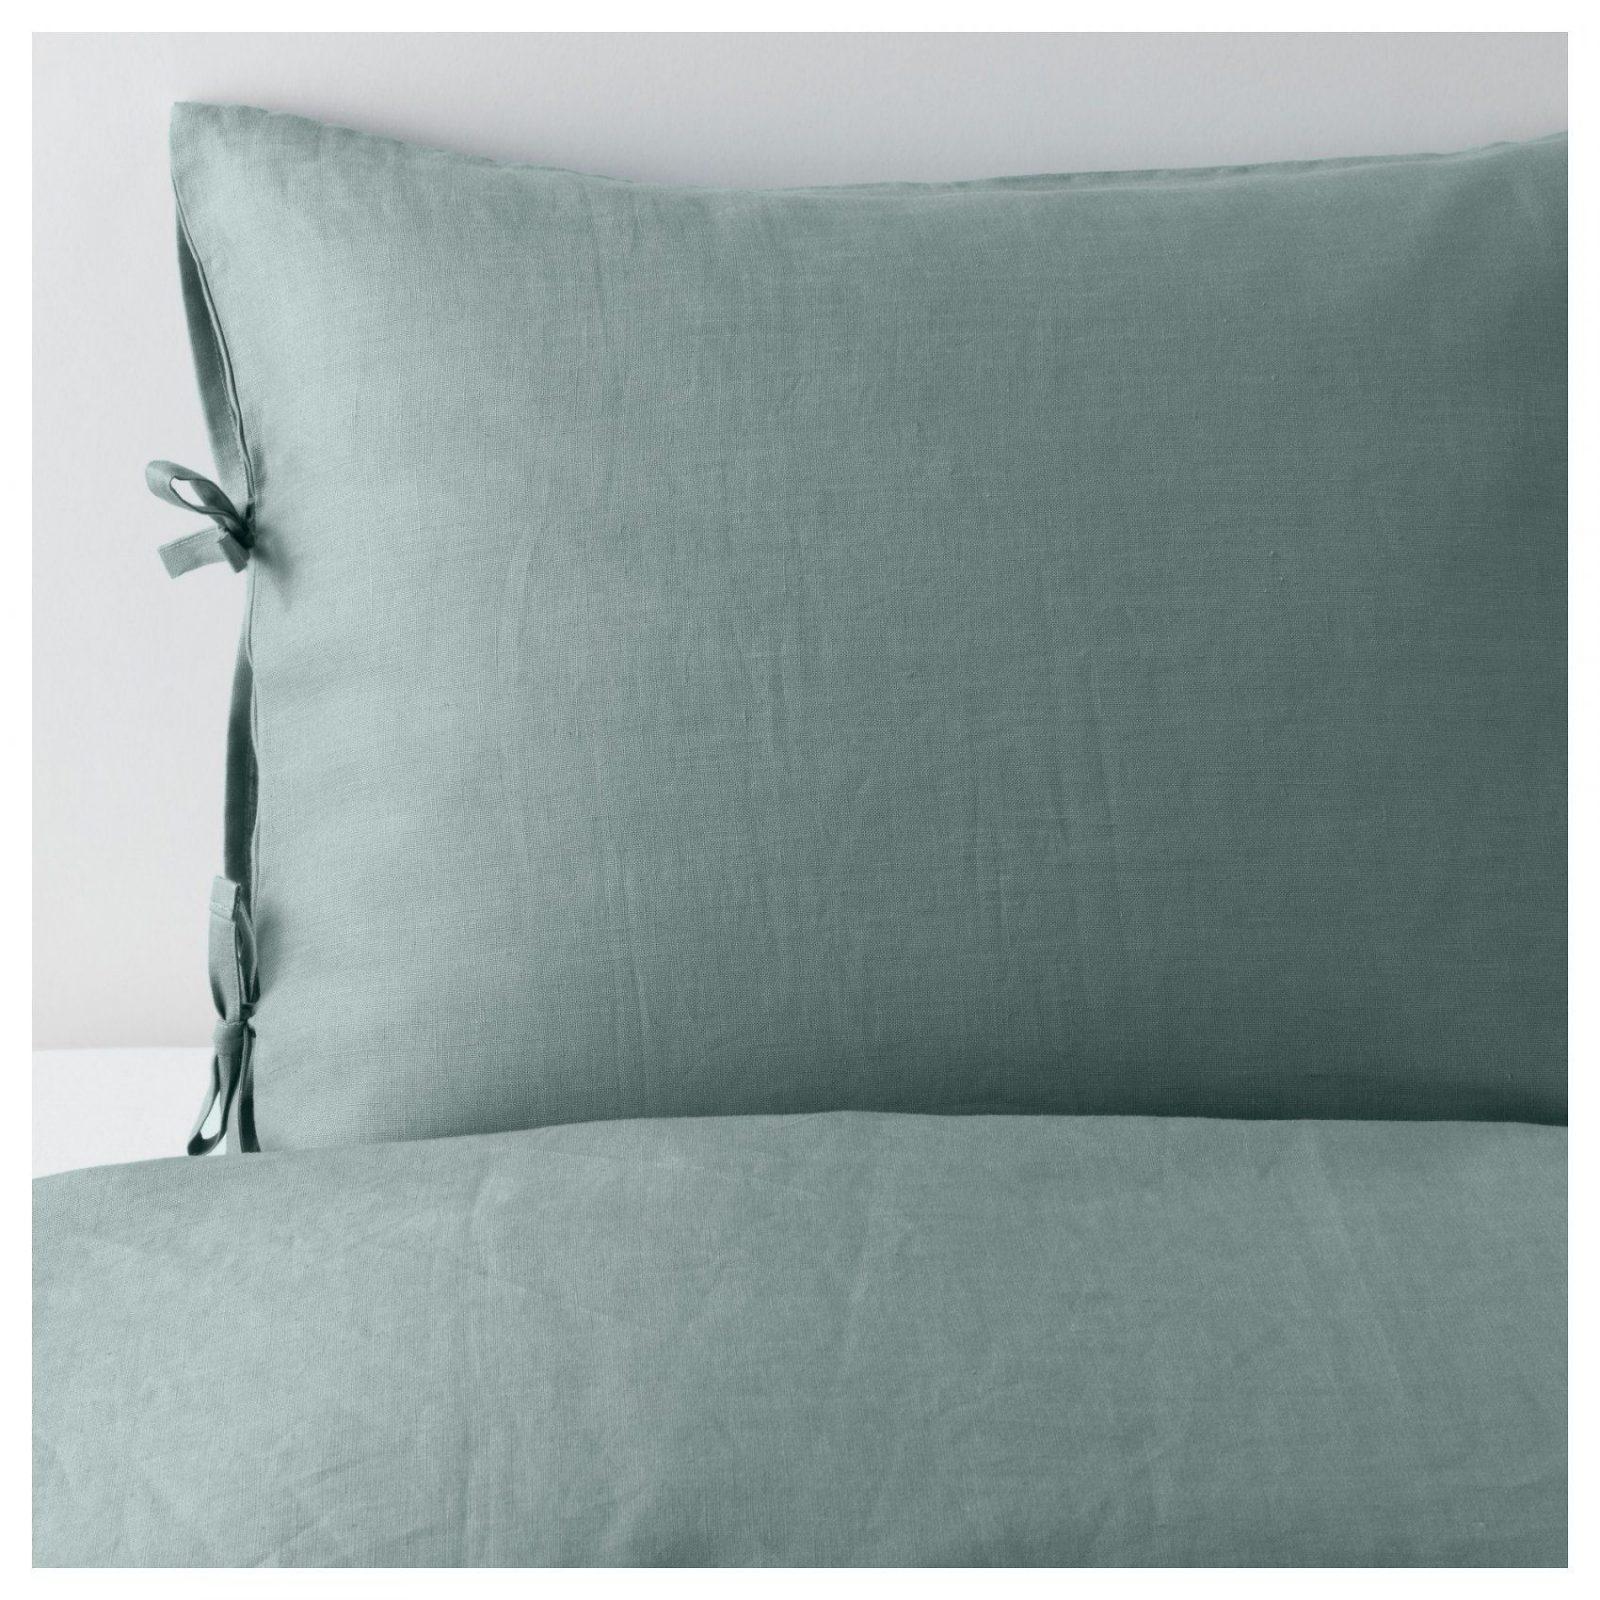 Ikea Tuvbräcka Bettwäsche Set 140200 Cm 8080 Bettbezug Grün 100